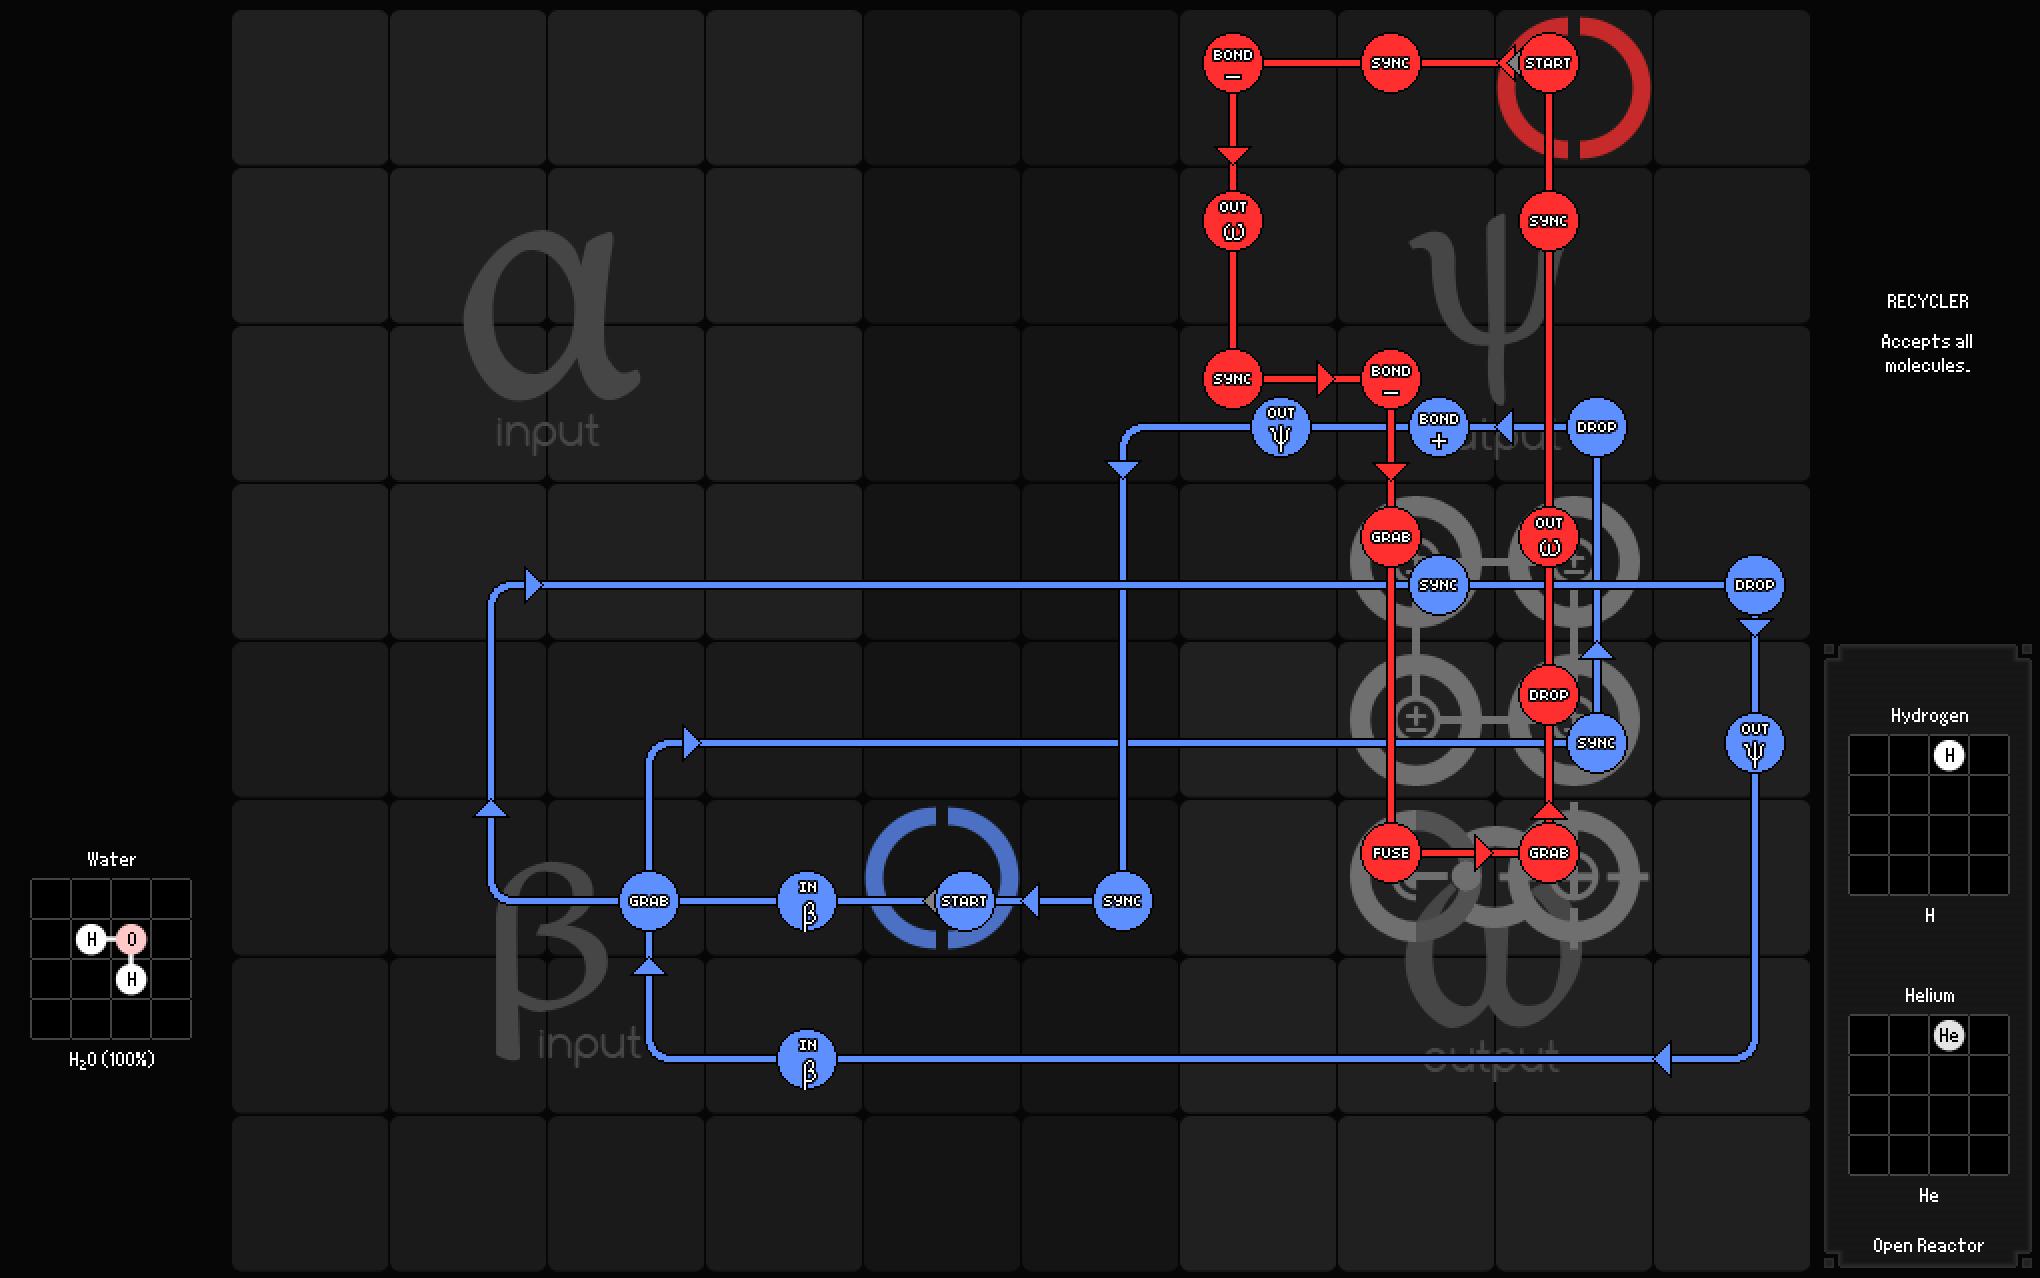 1_Story_Mode/5_Sikutar/SpaceChem-5.4.a/Reactor_2.png